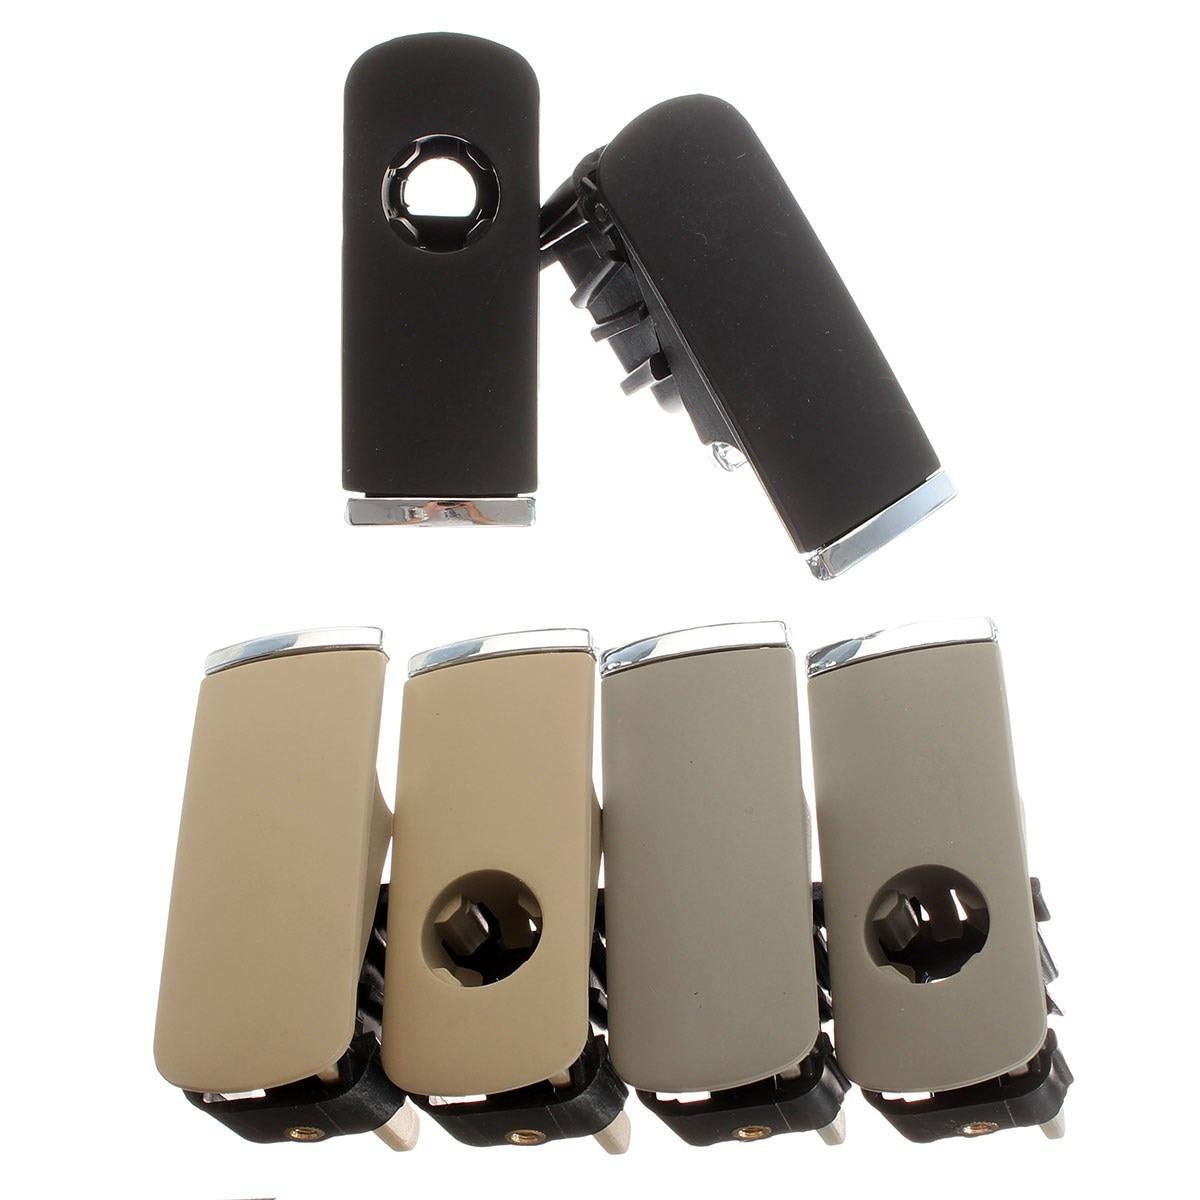 achetez en gros audi a4 bo te gants porte en ligne des grossistes audi a4 bo te gants. Black Bedroom Furniture Sets. Home Design Ideas